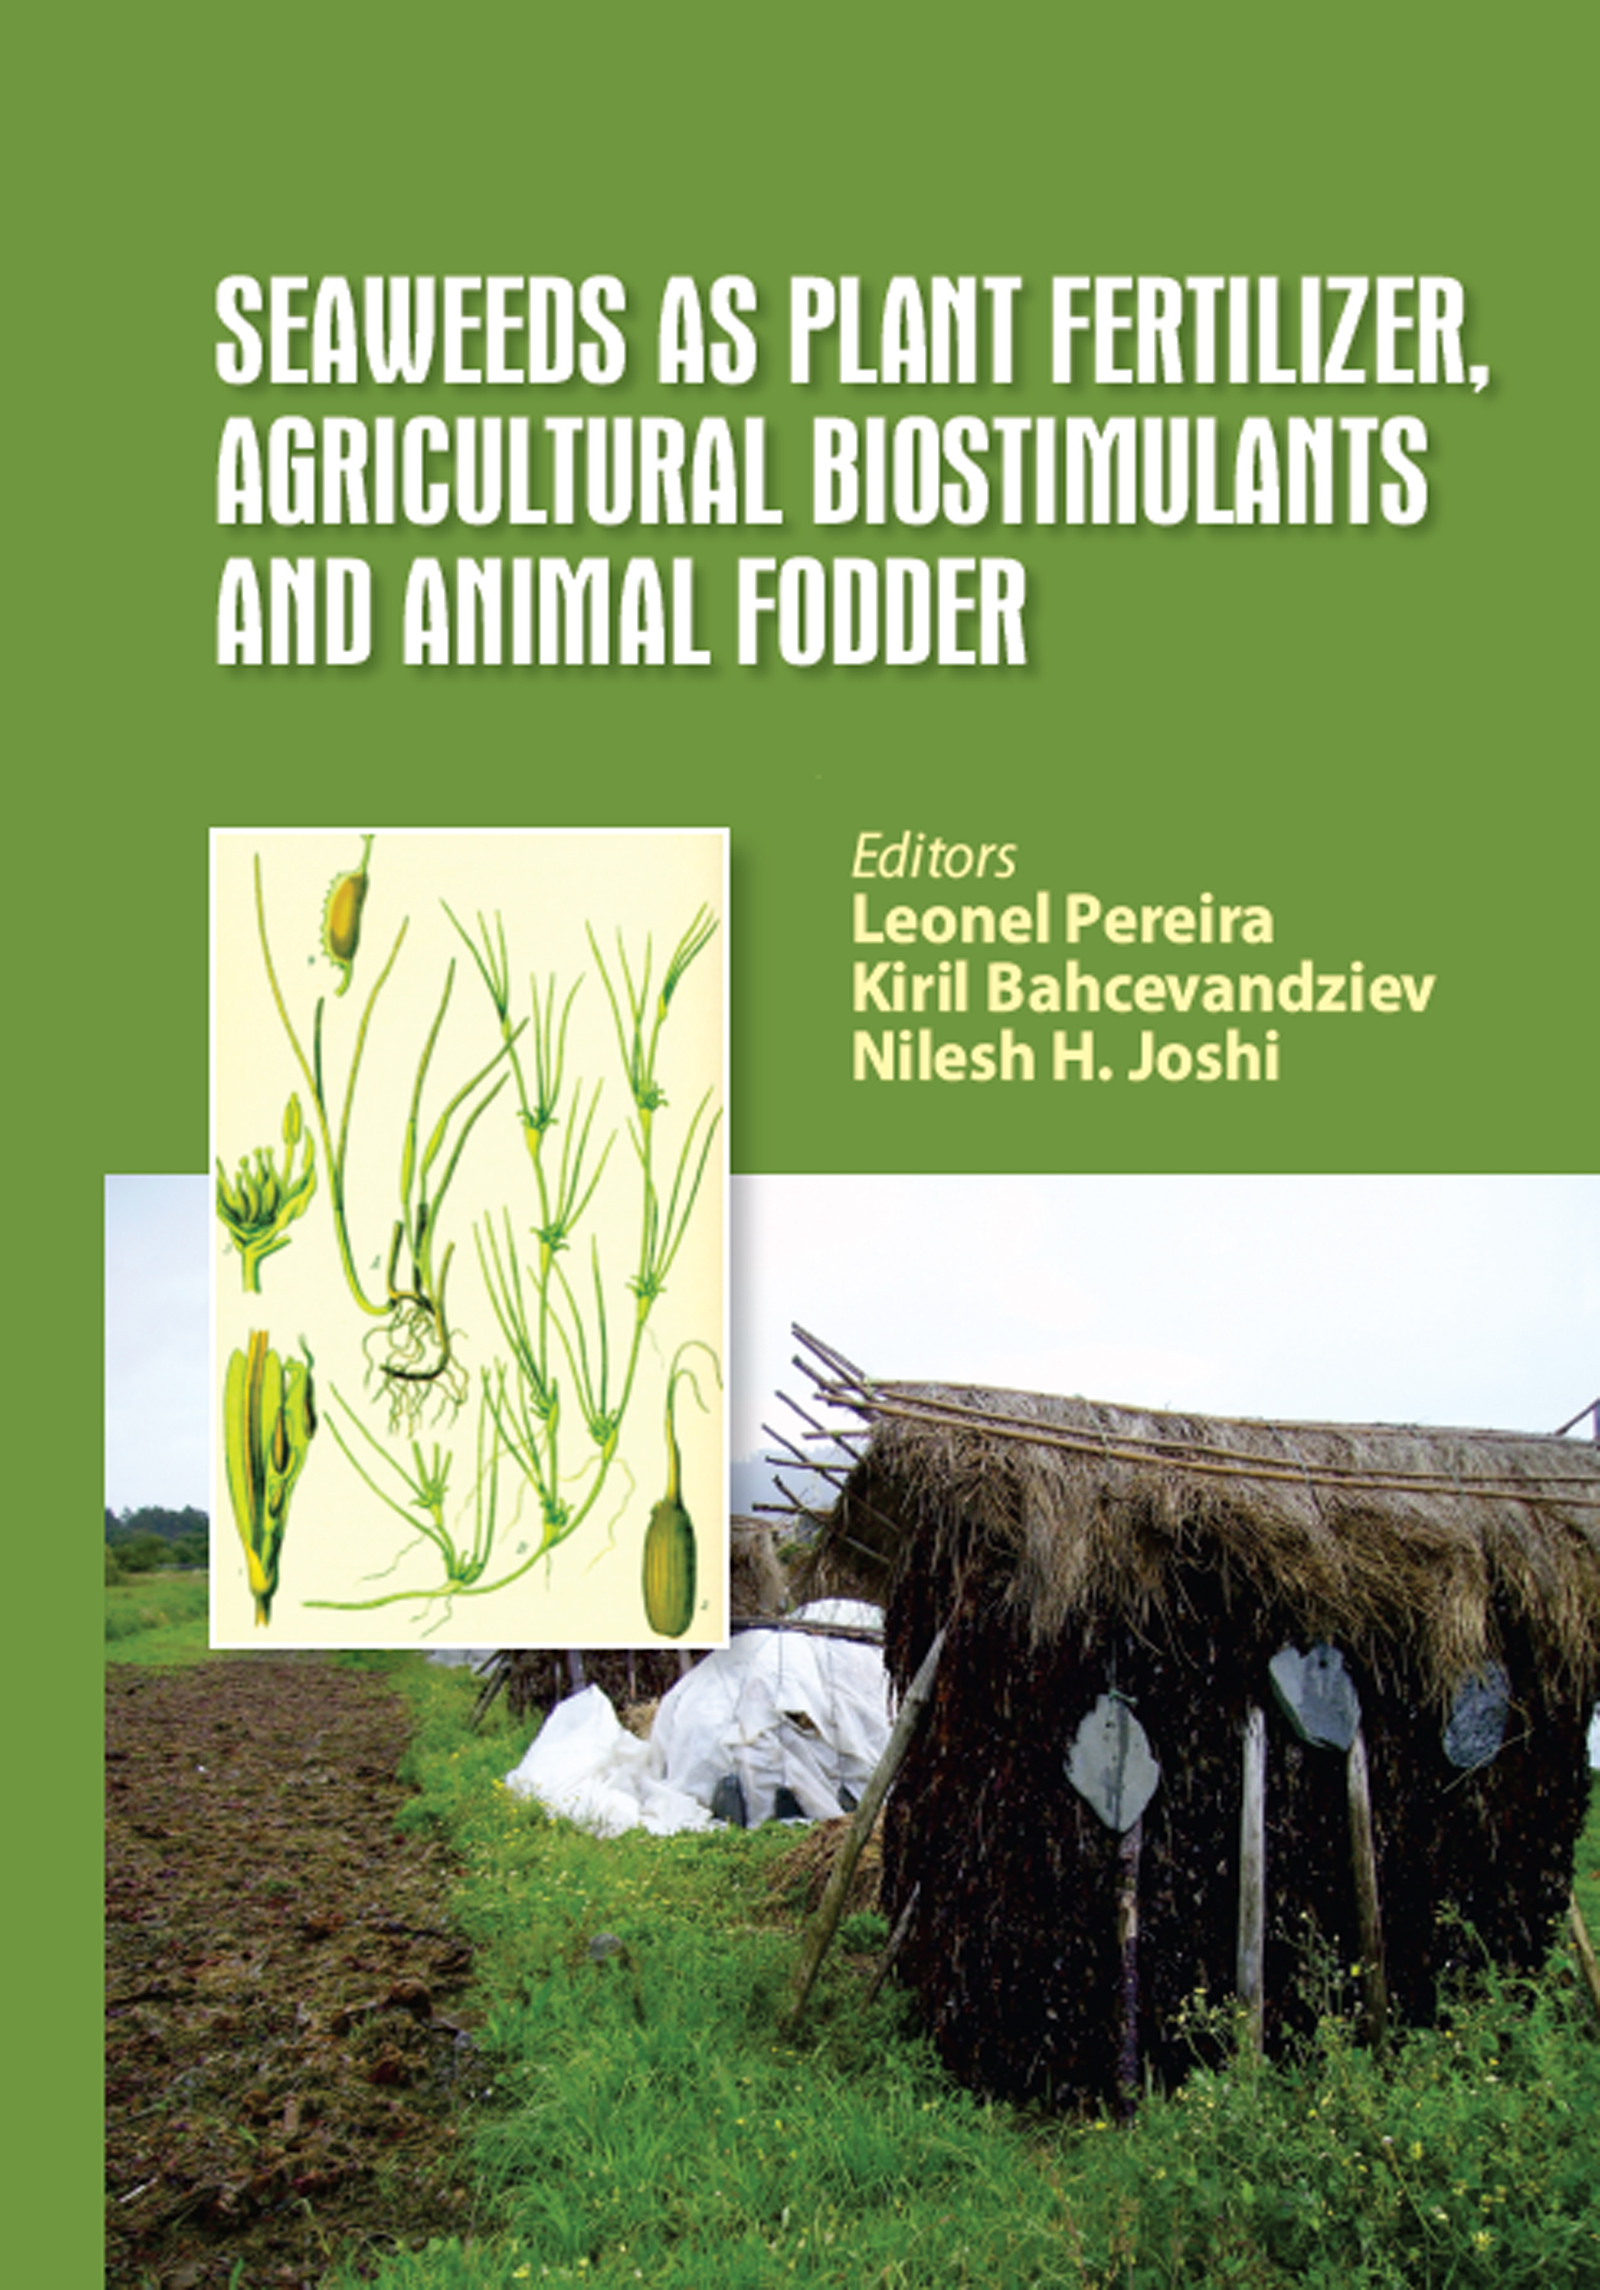 Seaweeds as Plant Fertilizer, Agricultural Biostimulants and Animal Fodder: 1st Edition (Hardback) book cover